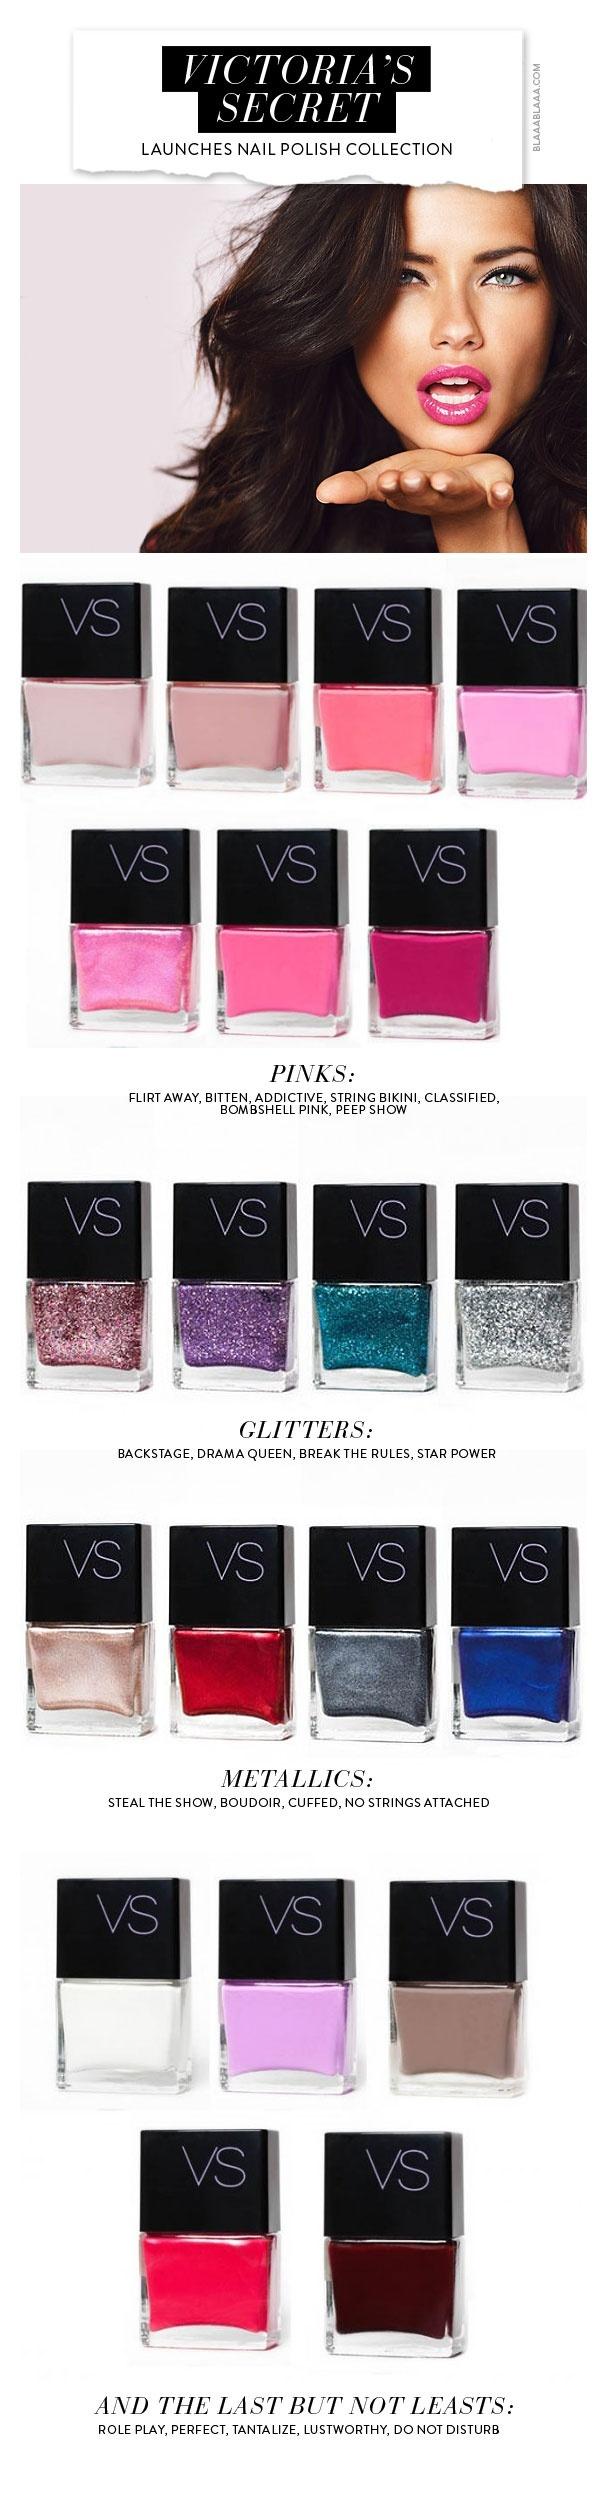 Victoria's Secret Nail Polish Collection